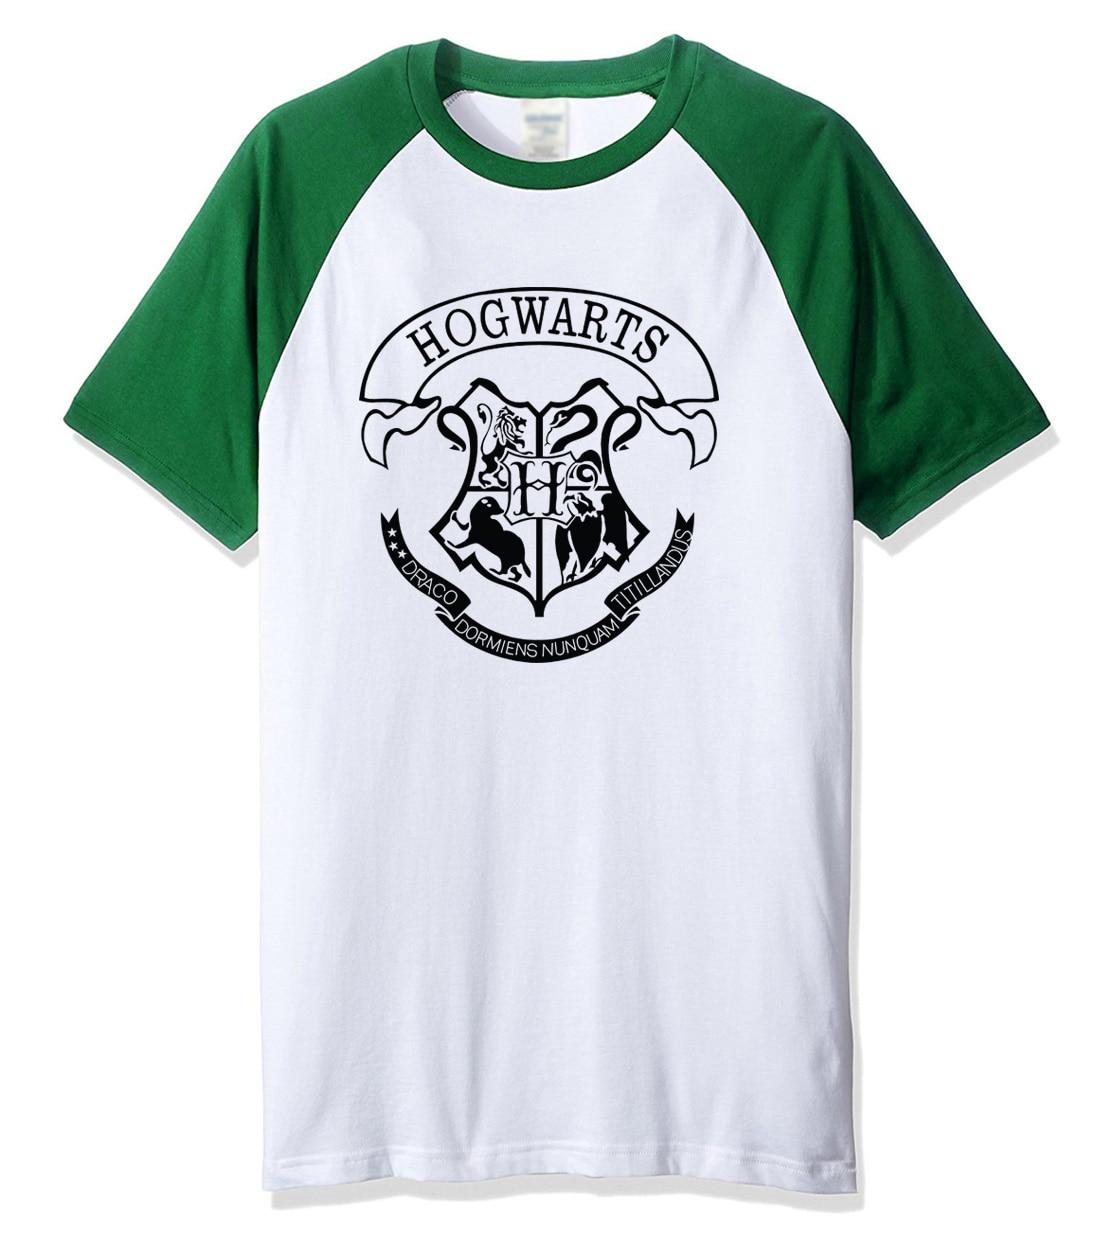 2019 summer t shirt men short sleeve cotton O-neck funny t shirts Hogwarts letter print men's sportswear raglan t-shirt tops tee